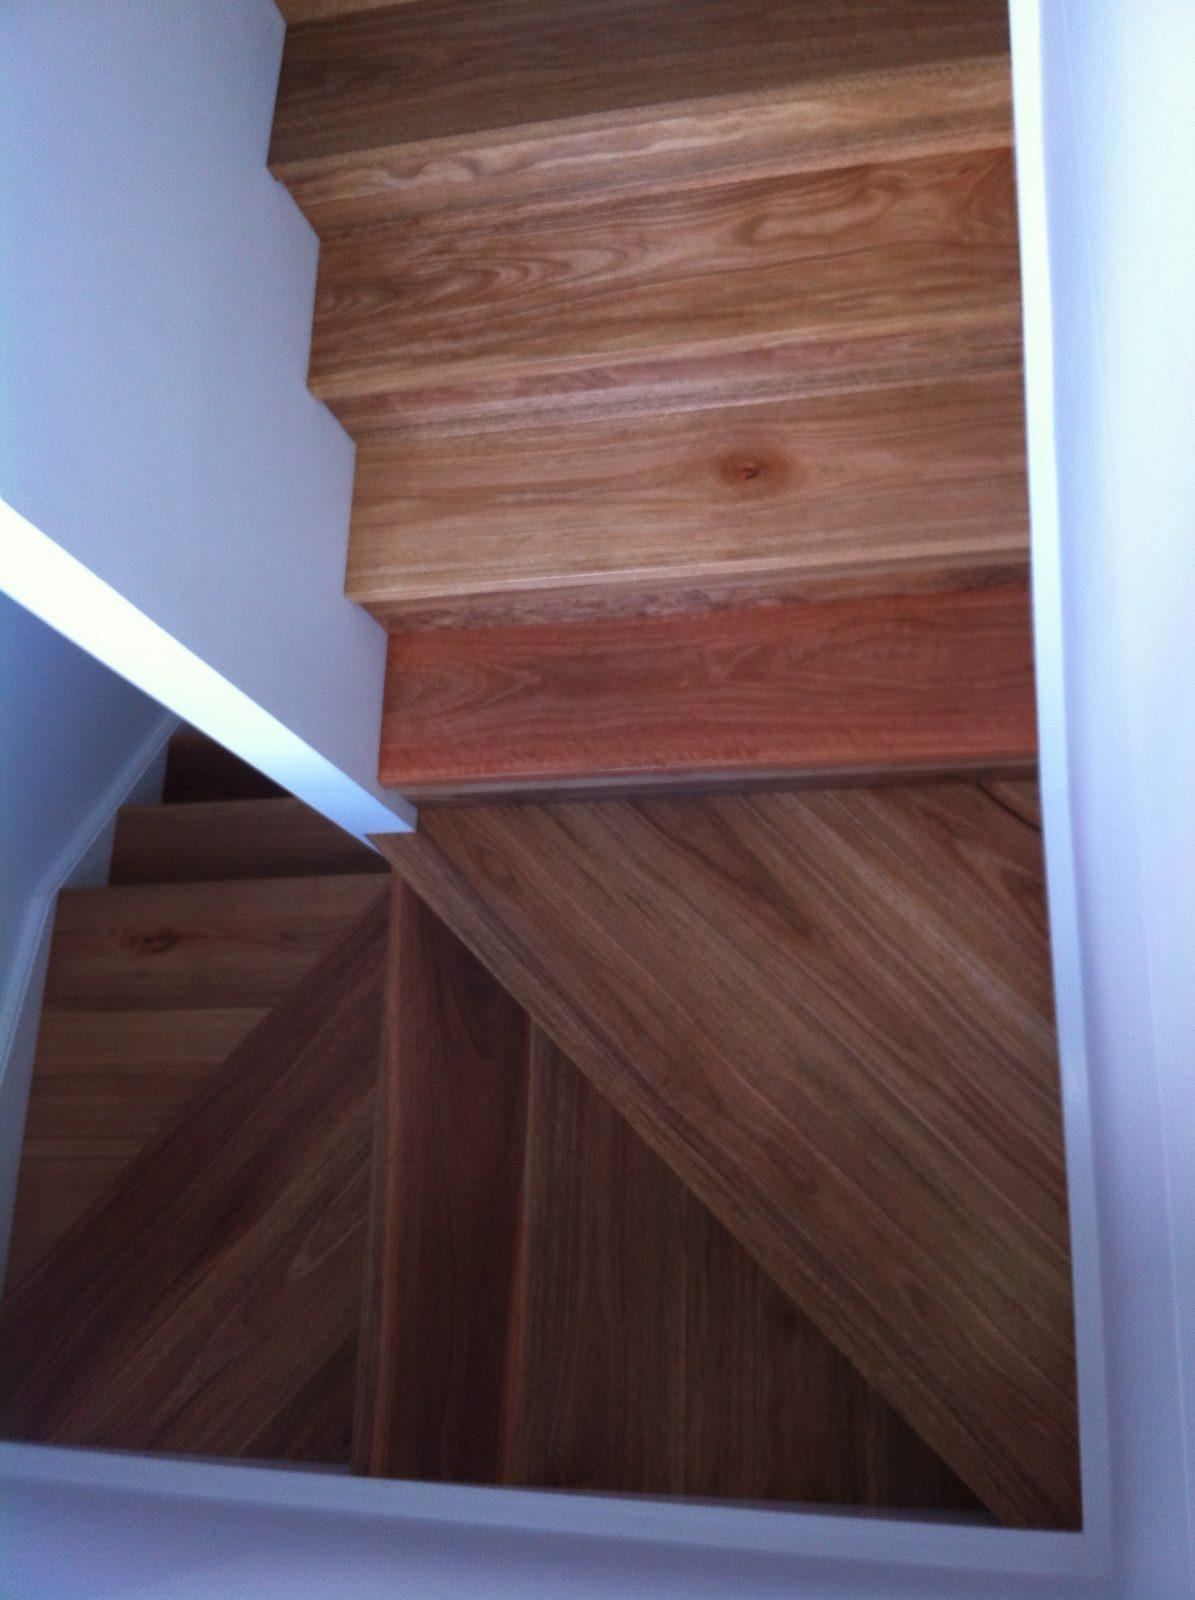 kellyville Ridge job – Staircase landing in Spotted Gum